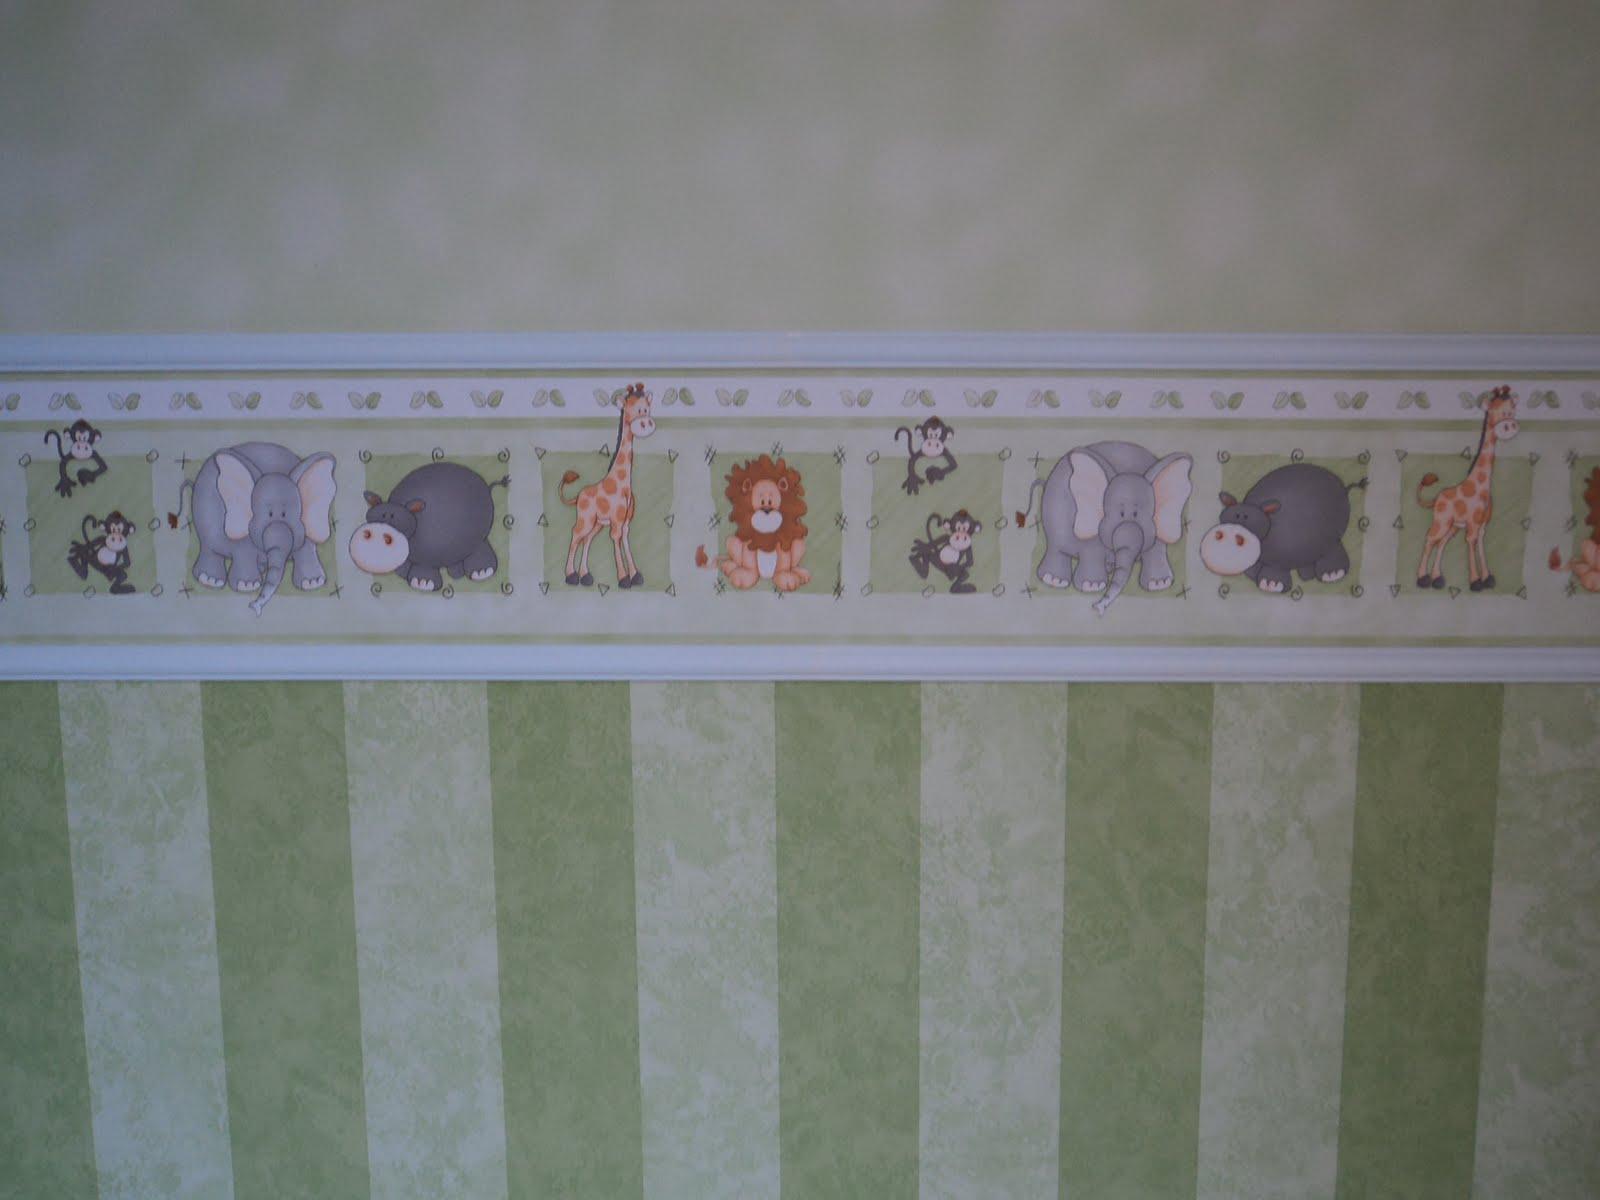 20170217041353 papel de parede quarto de bebe faixa - Papel pared bebe ...